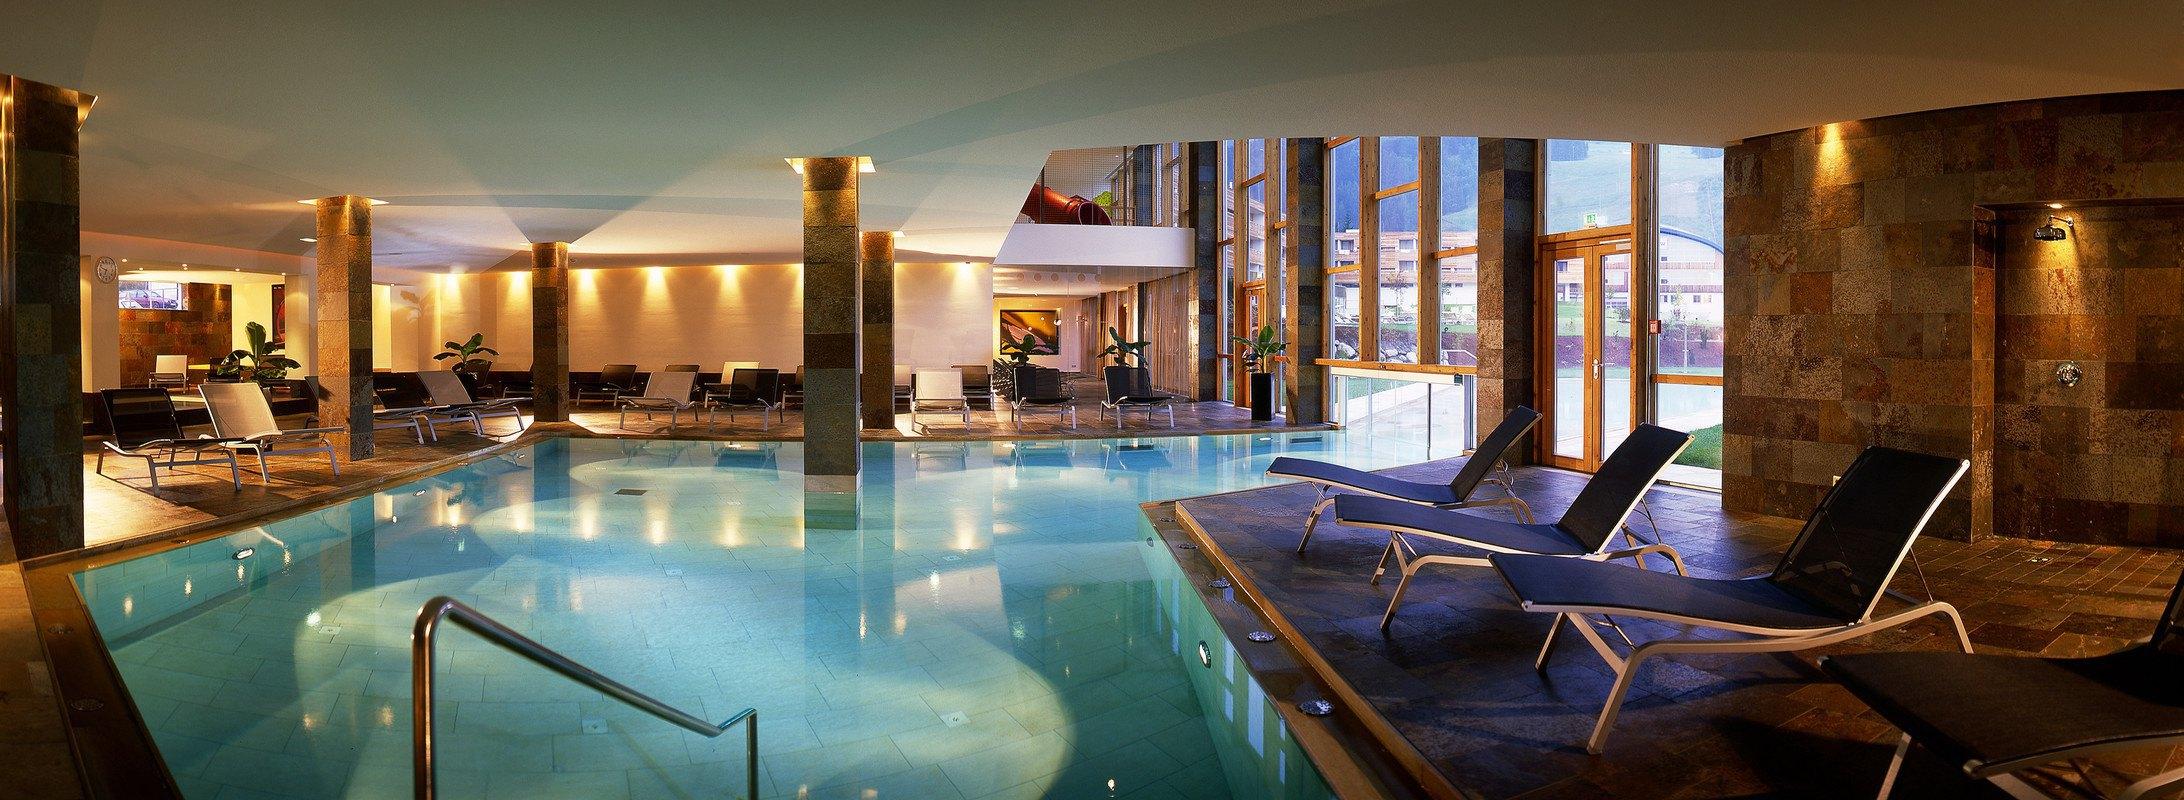 Falkensteiner hotel spa carinzia tr polach in montagna - Hotel montagna con piscina esterna riscaldata ...